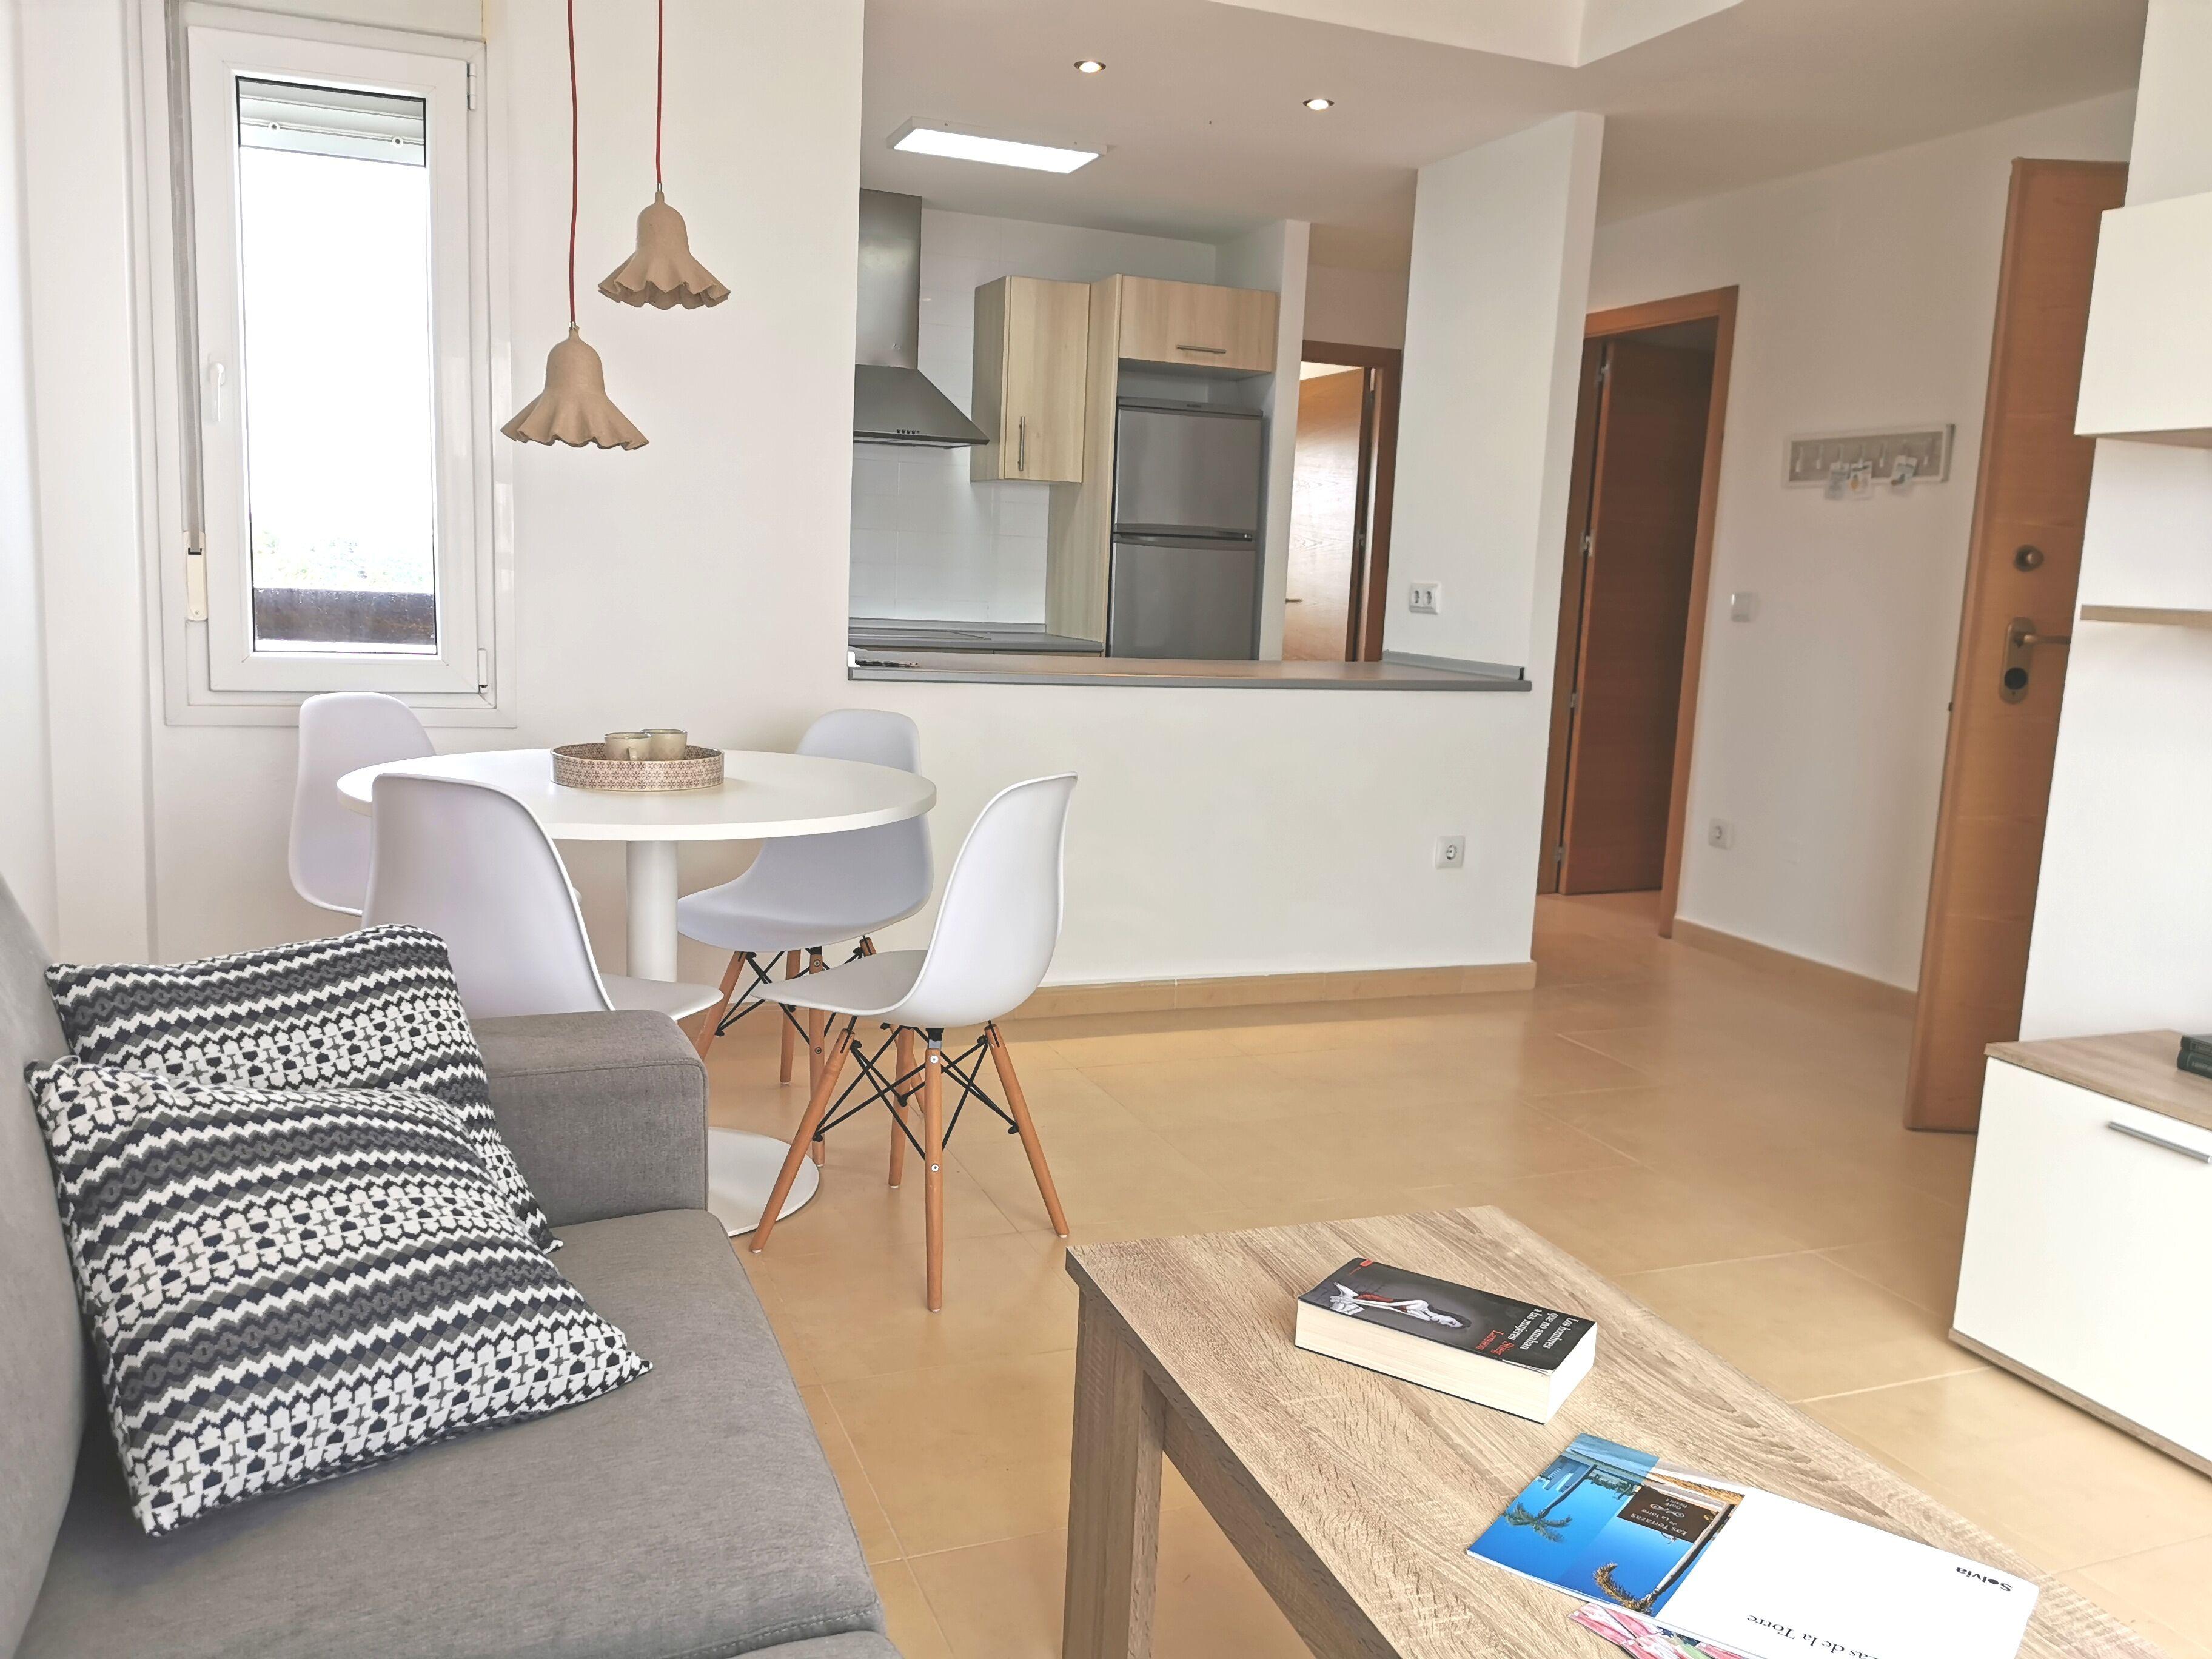 kf943544: Apartment for sale in Roldan